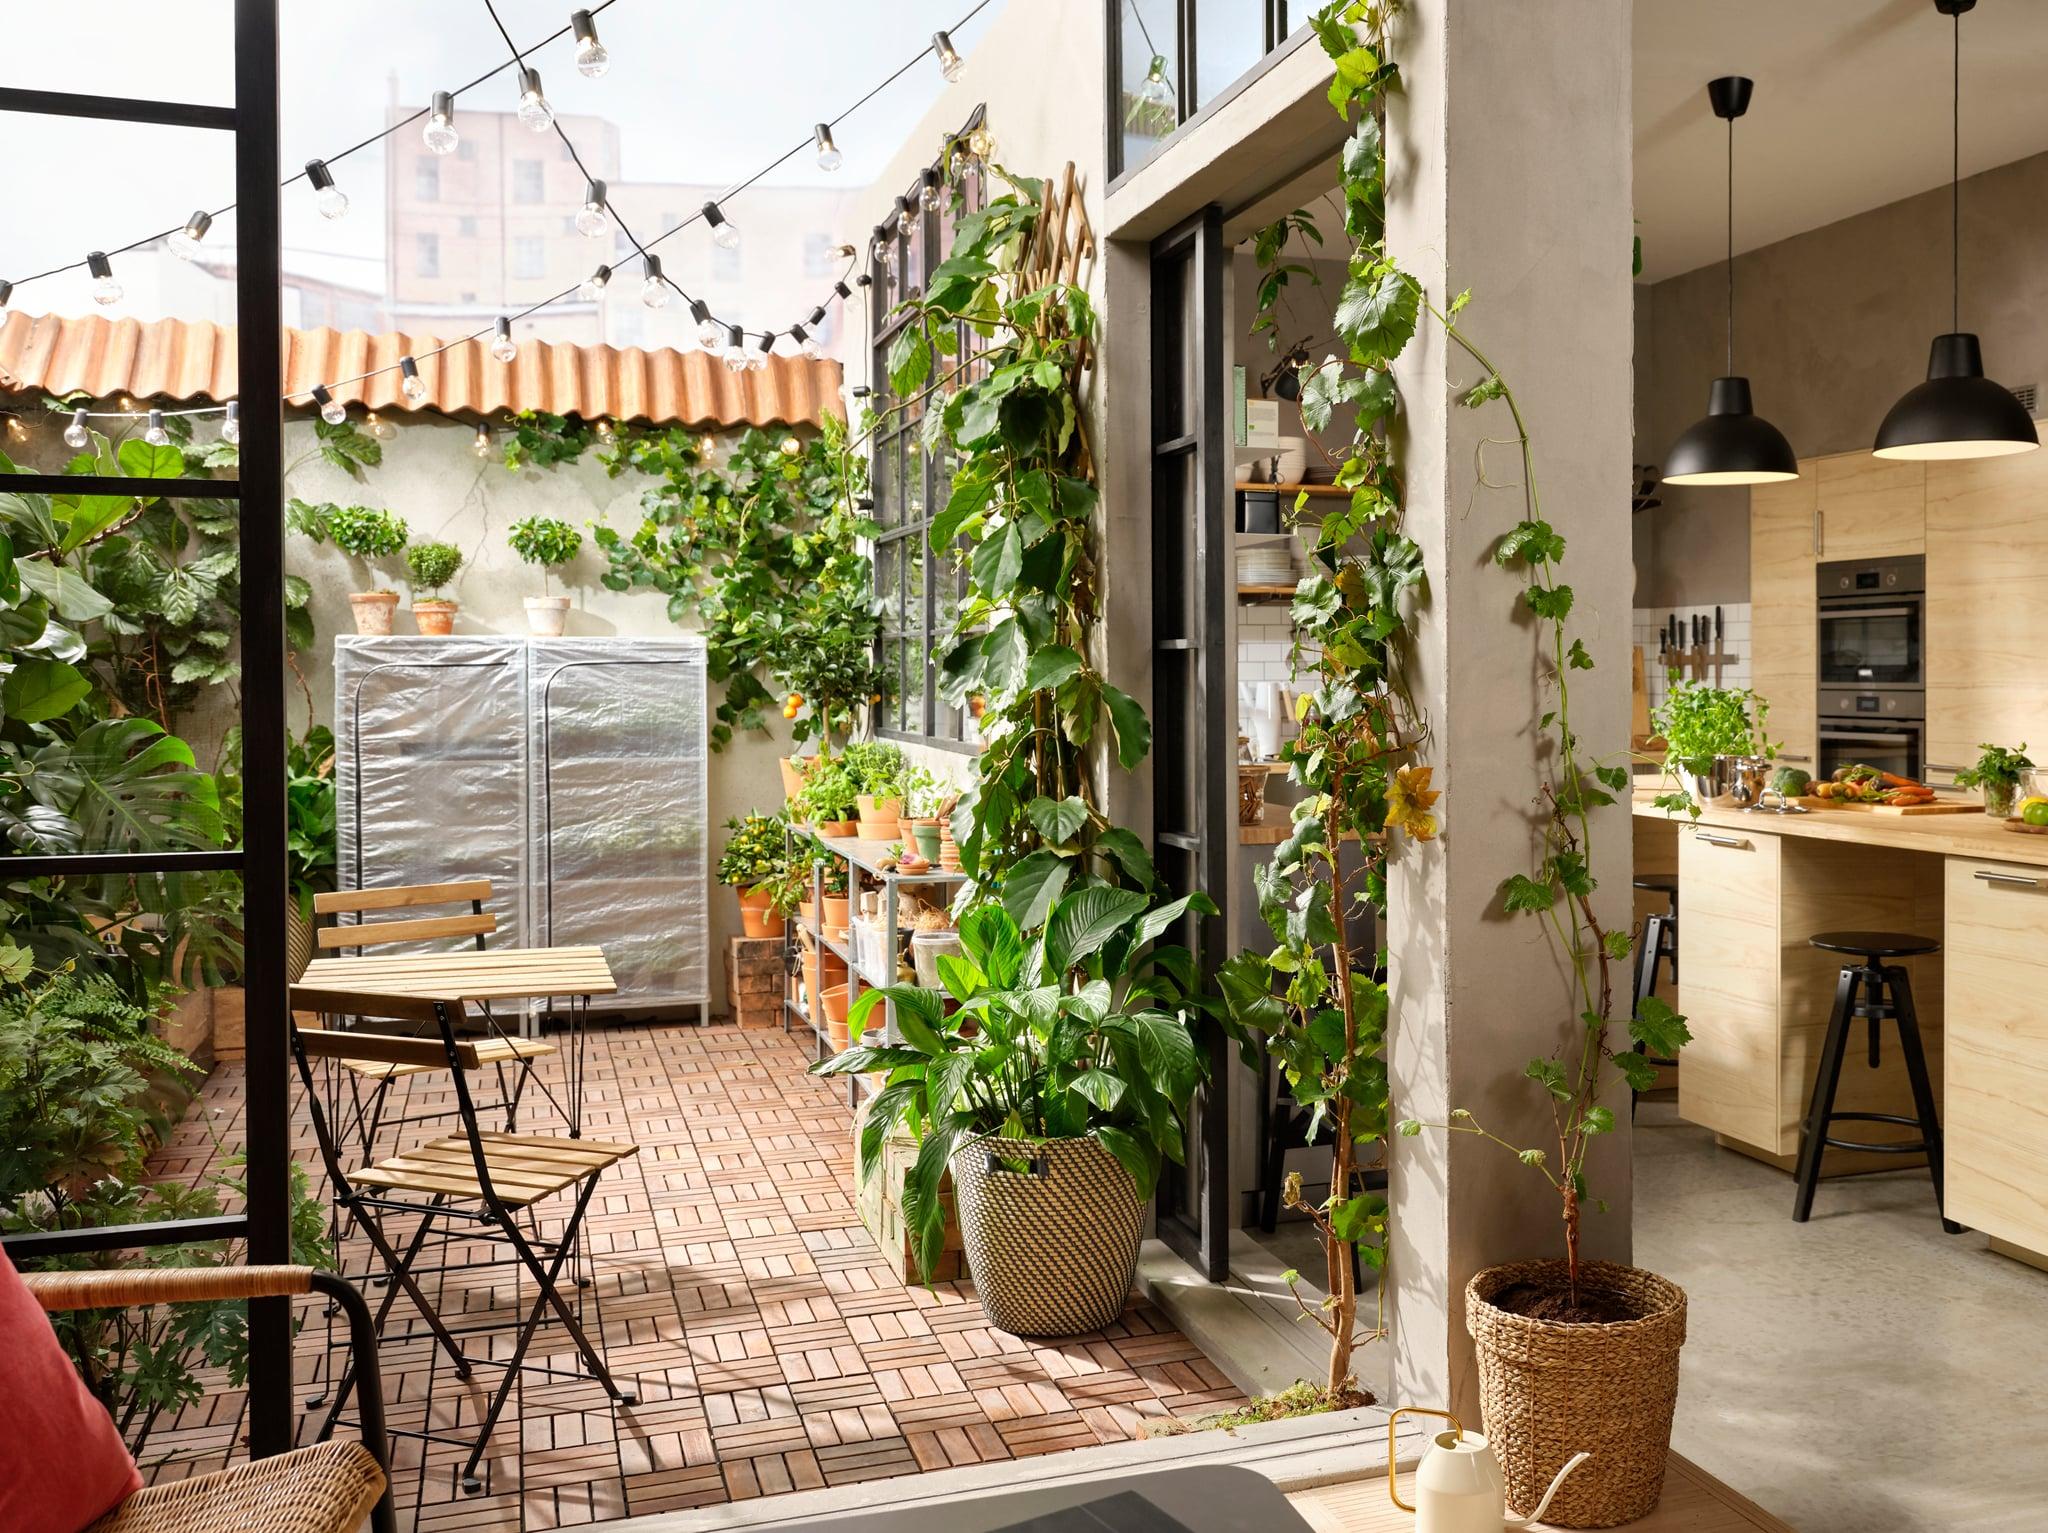 An urban retreat